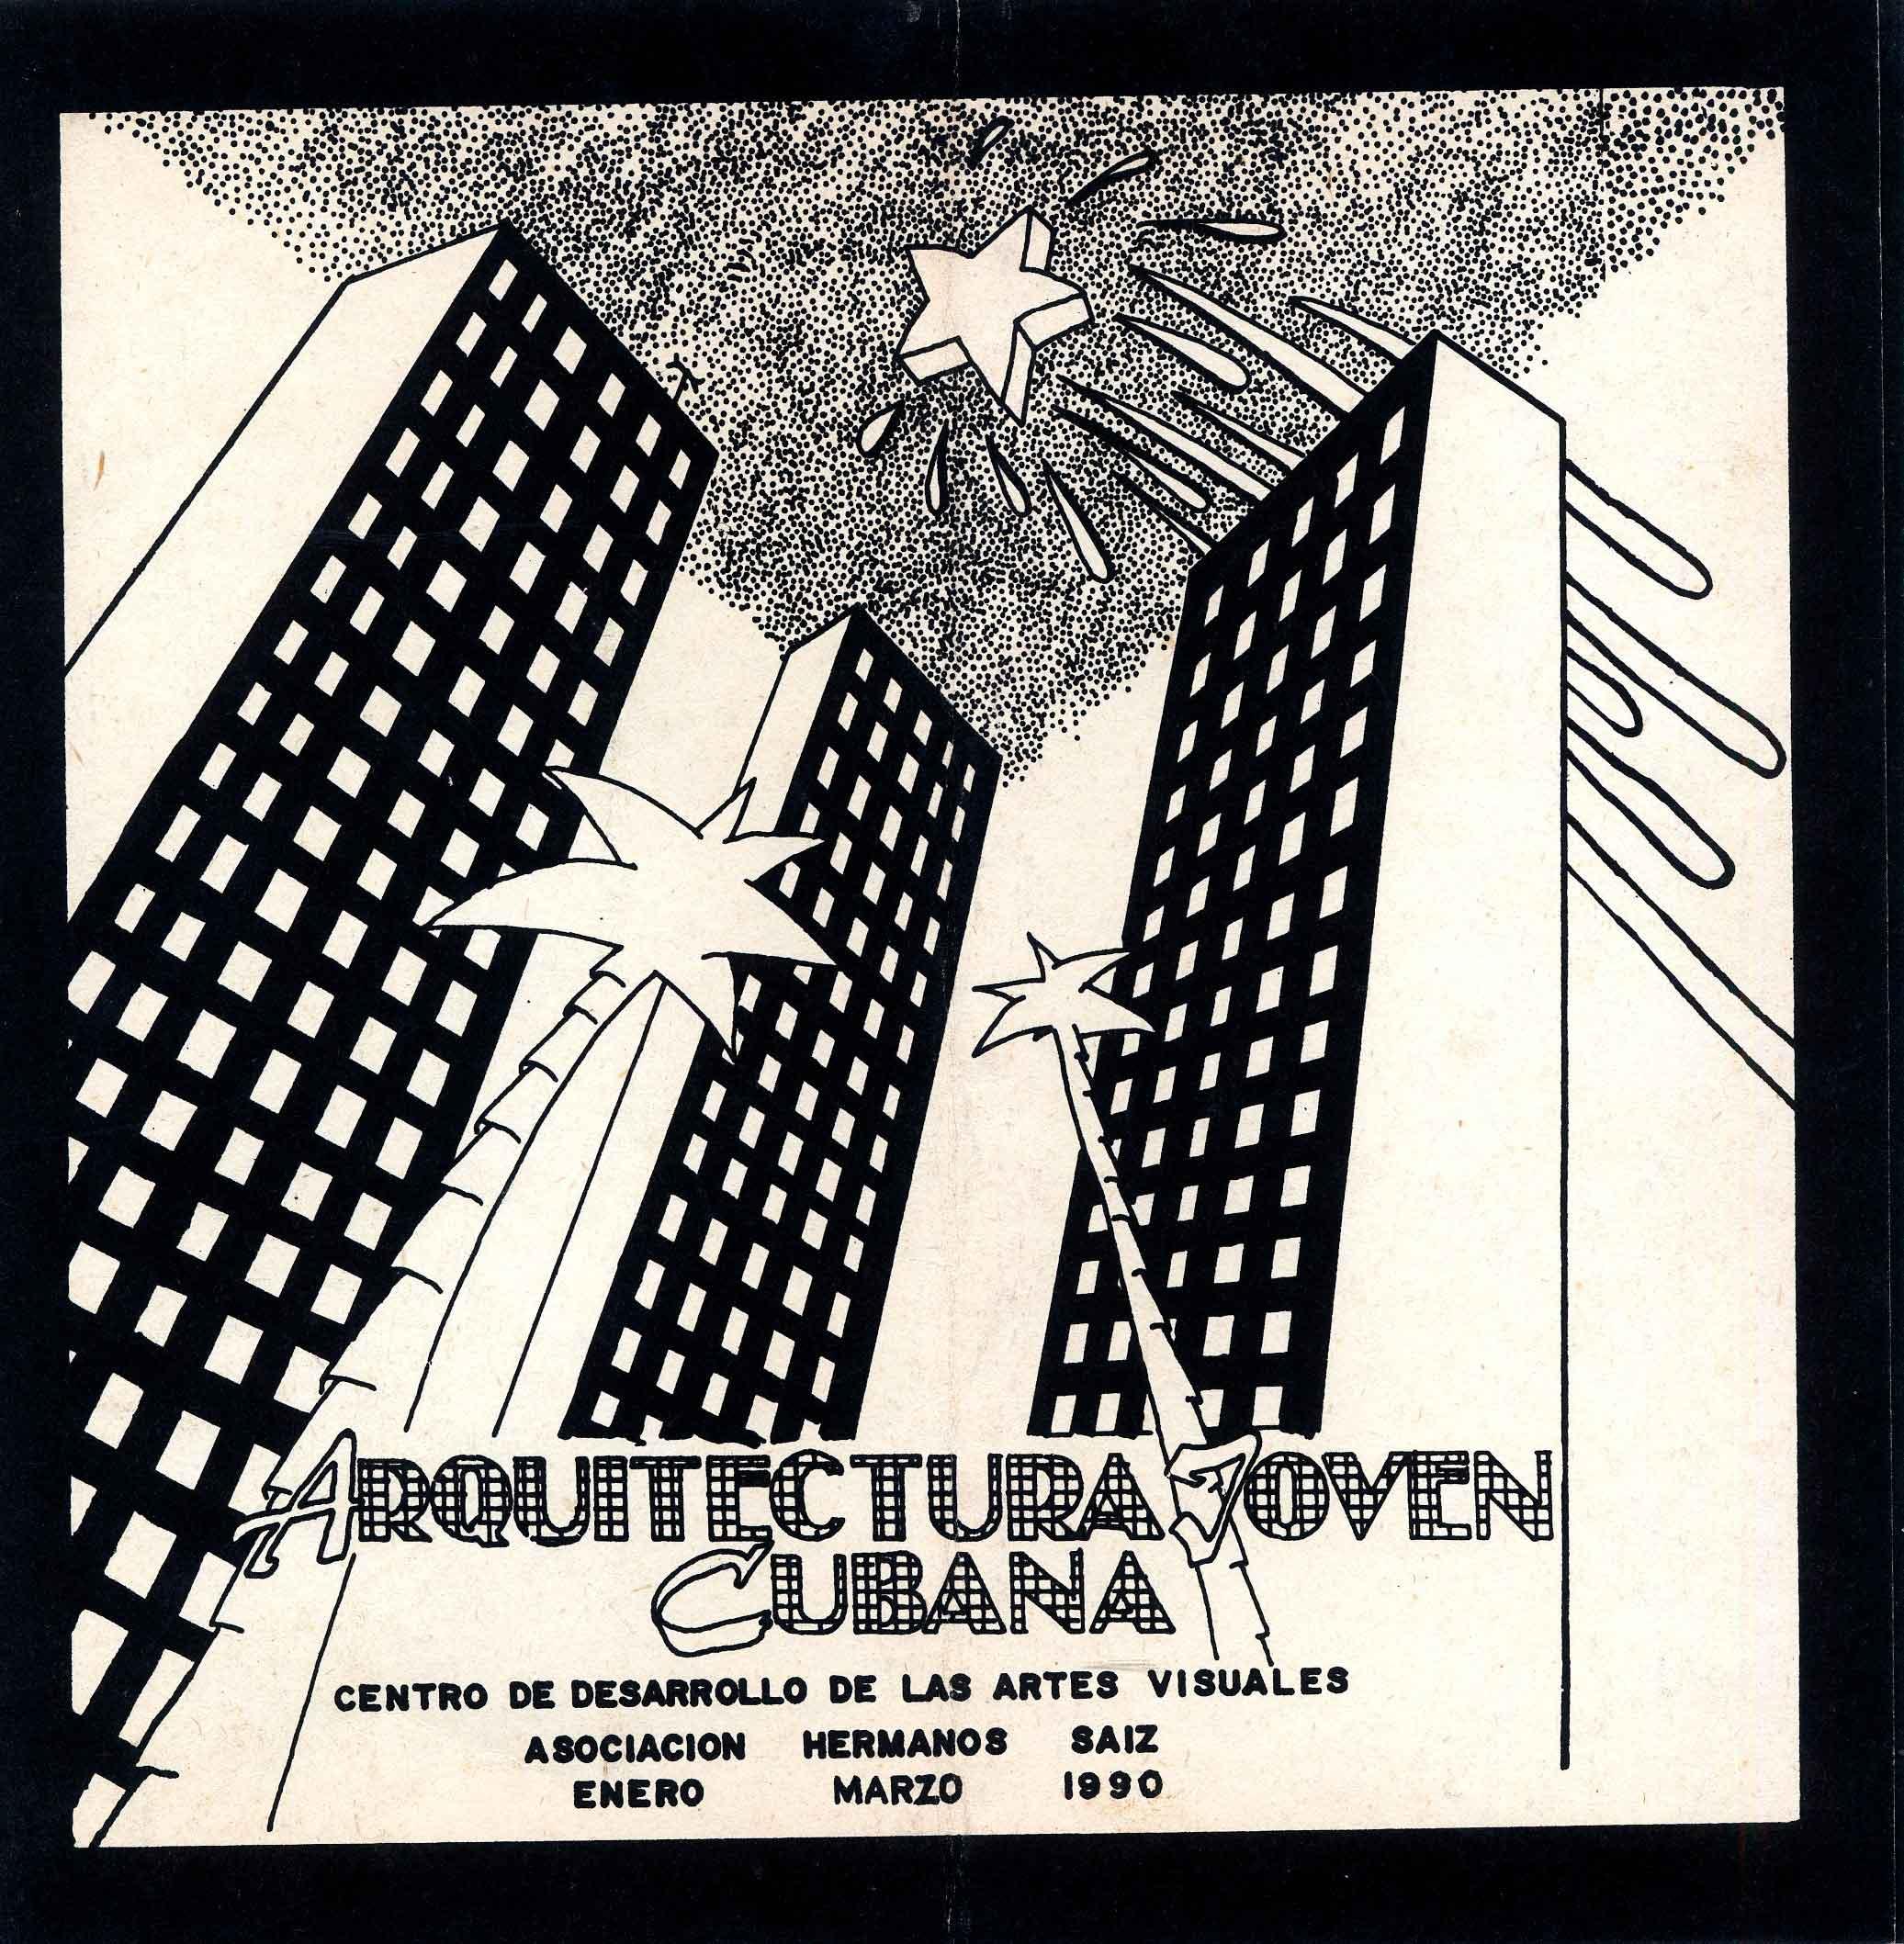 4_catalogo-expo-Arquitectura-Joven-Cubana.-009W